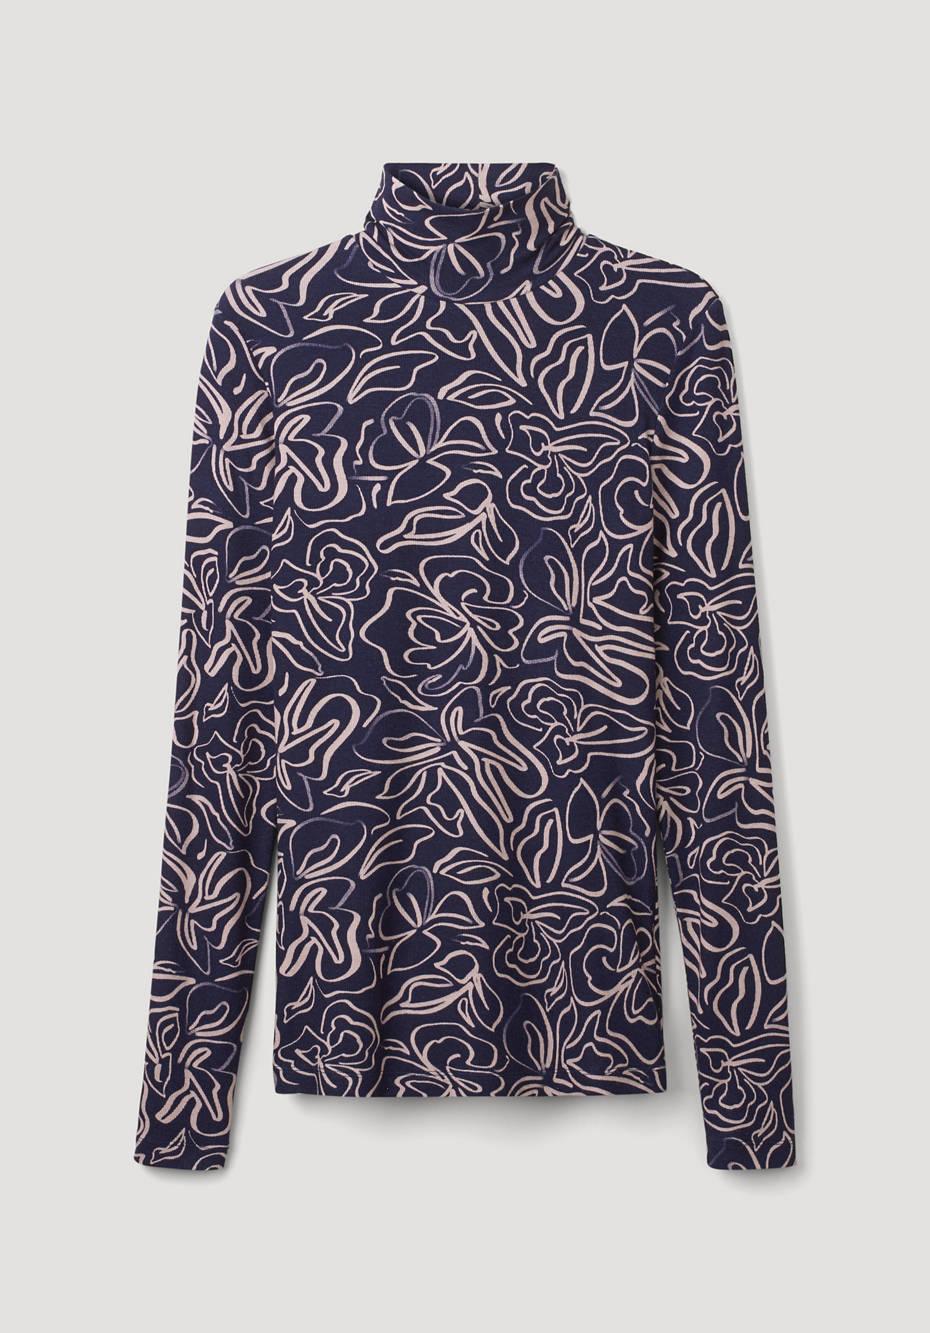 Shirt made of Tencel ™ Modal with virgin wool